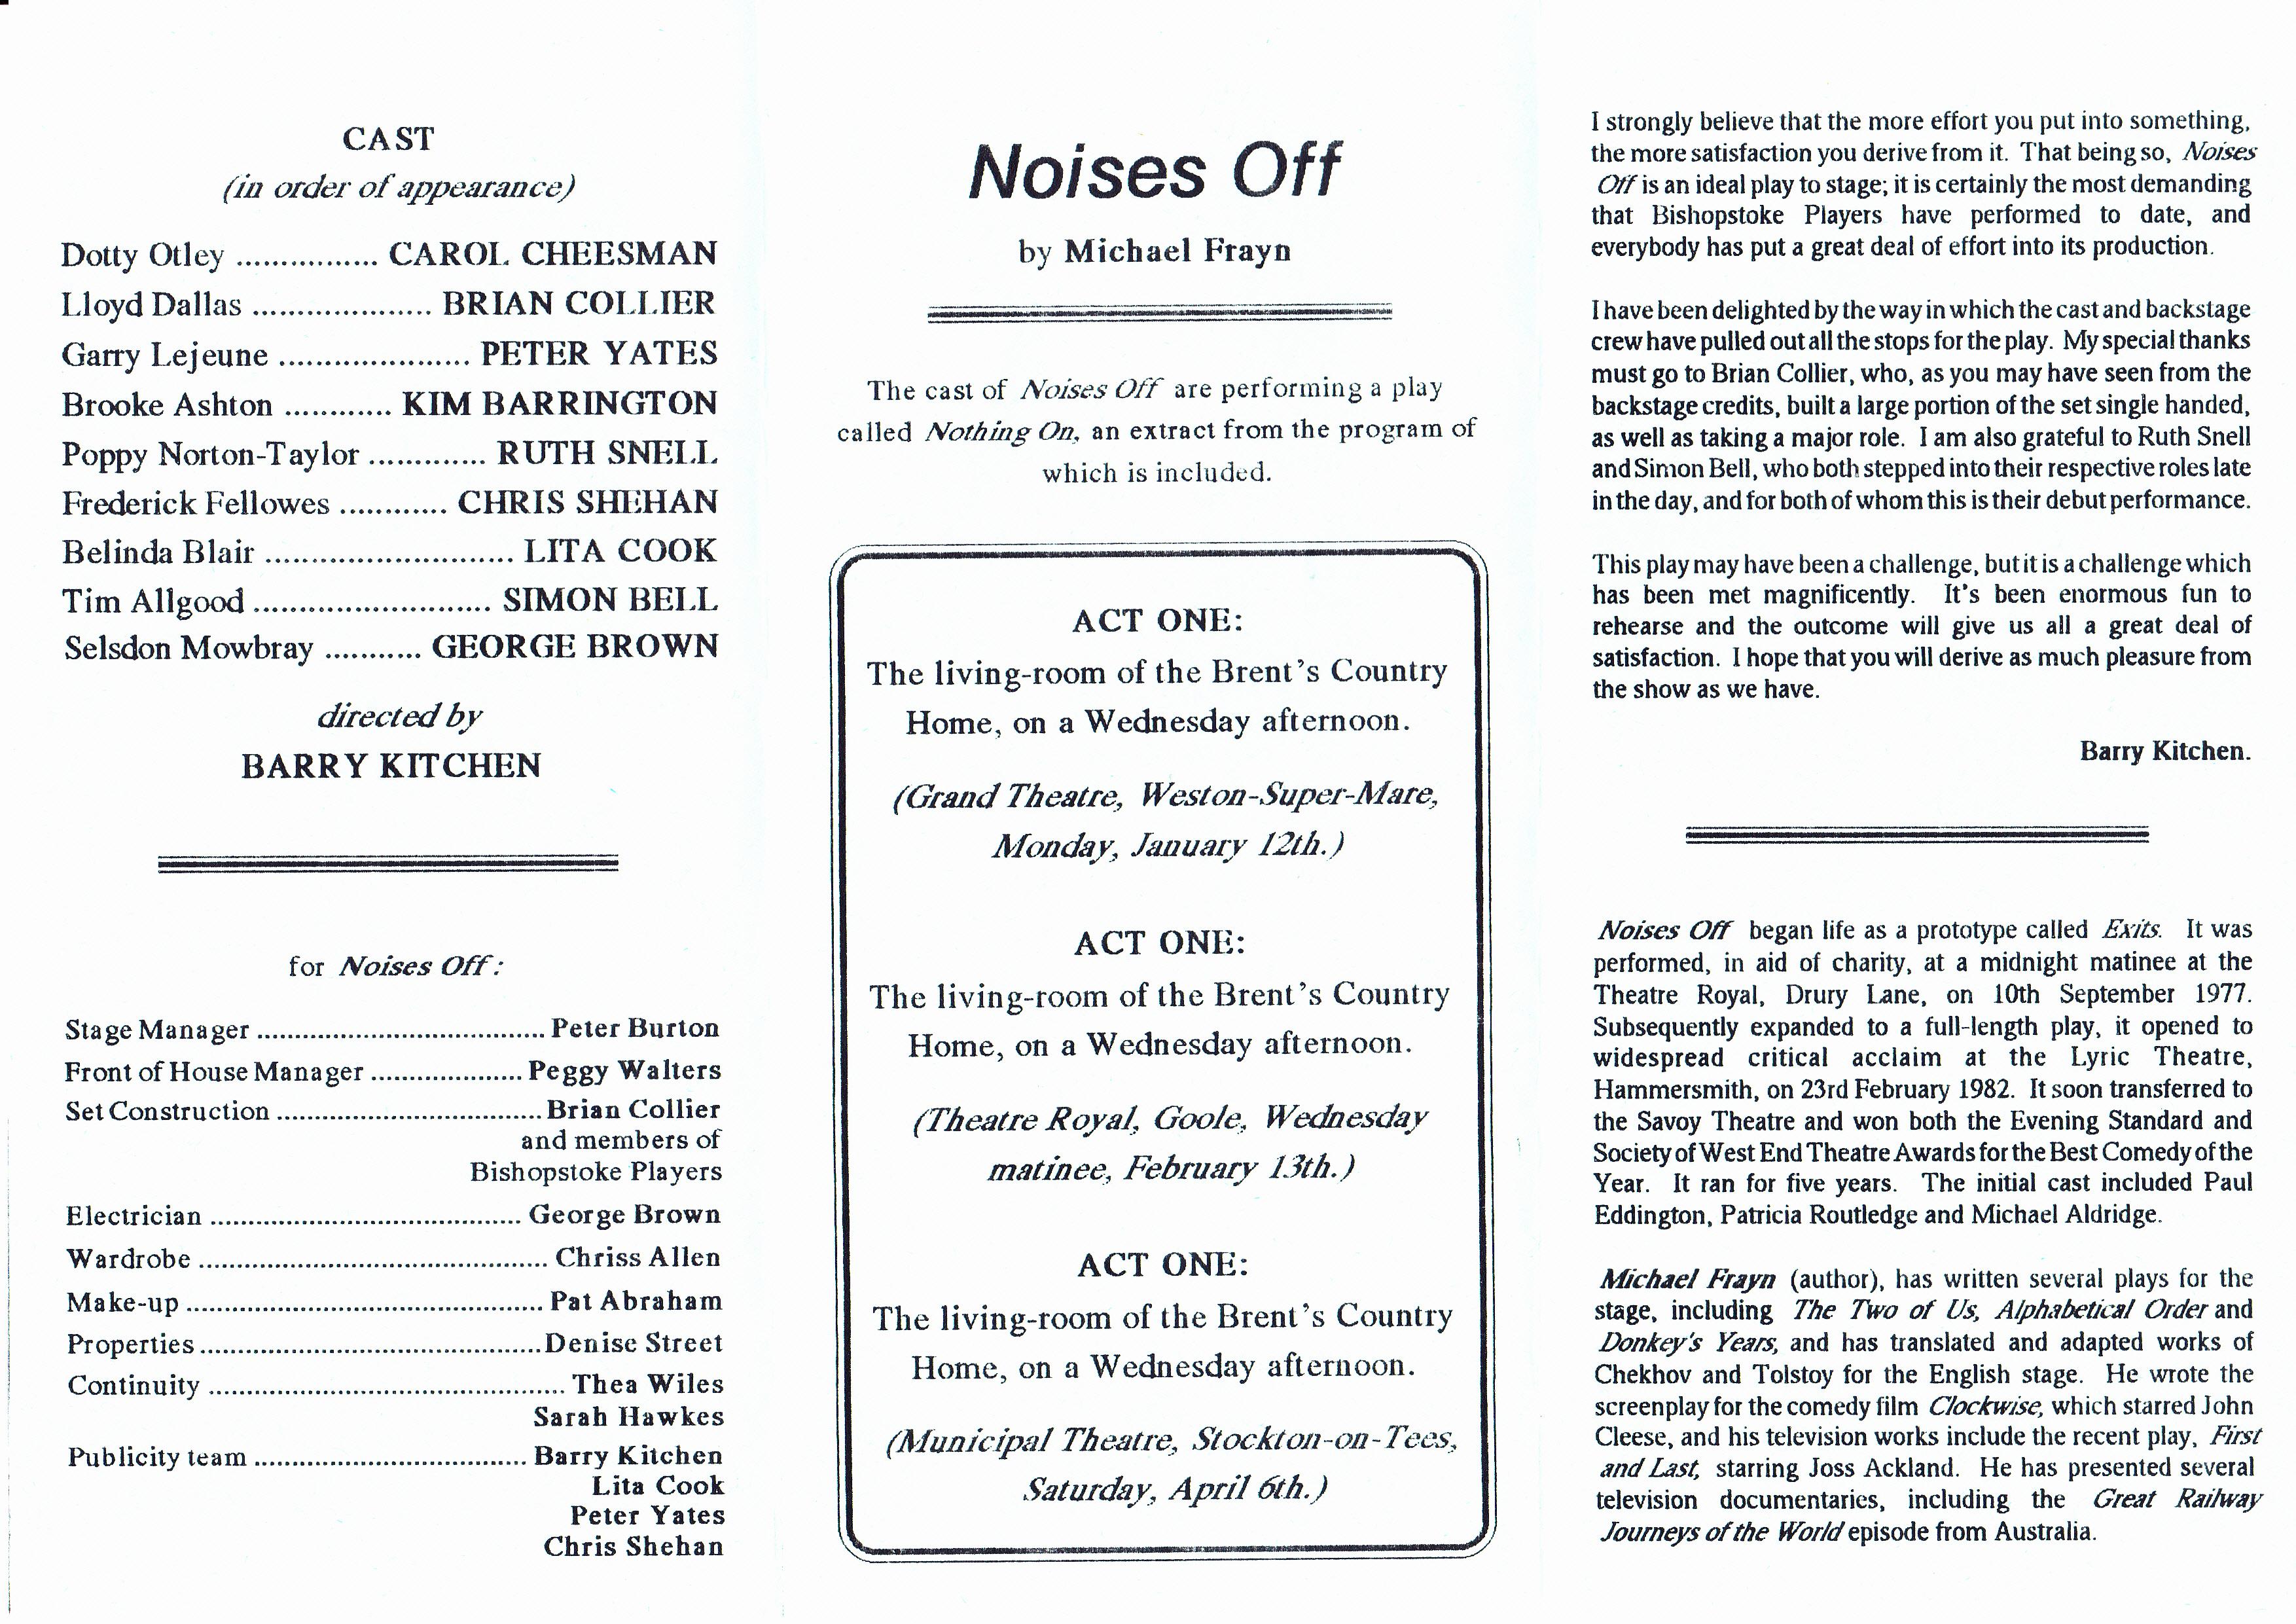 1990-1994 – Bishopstoke Players